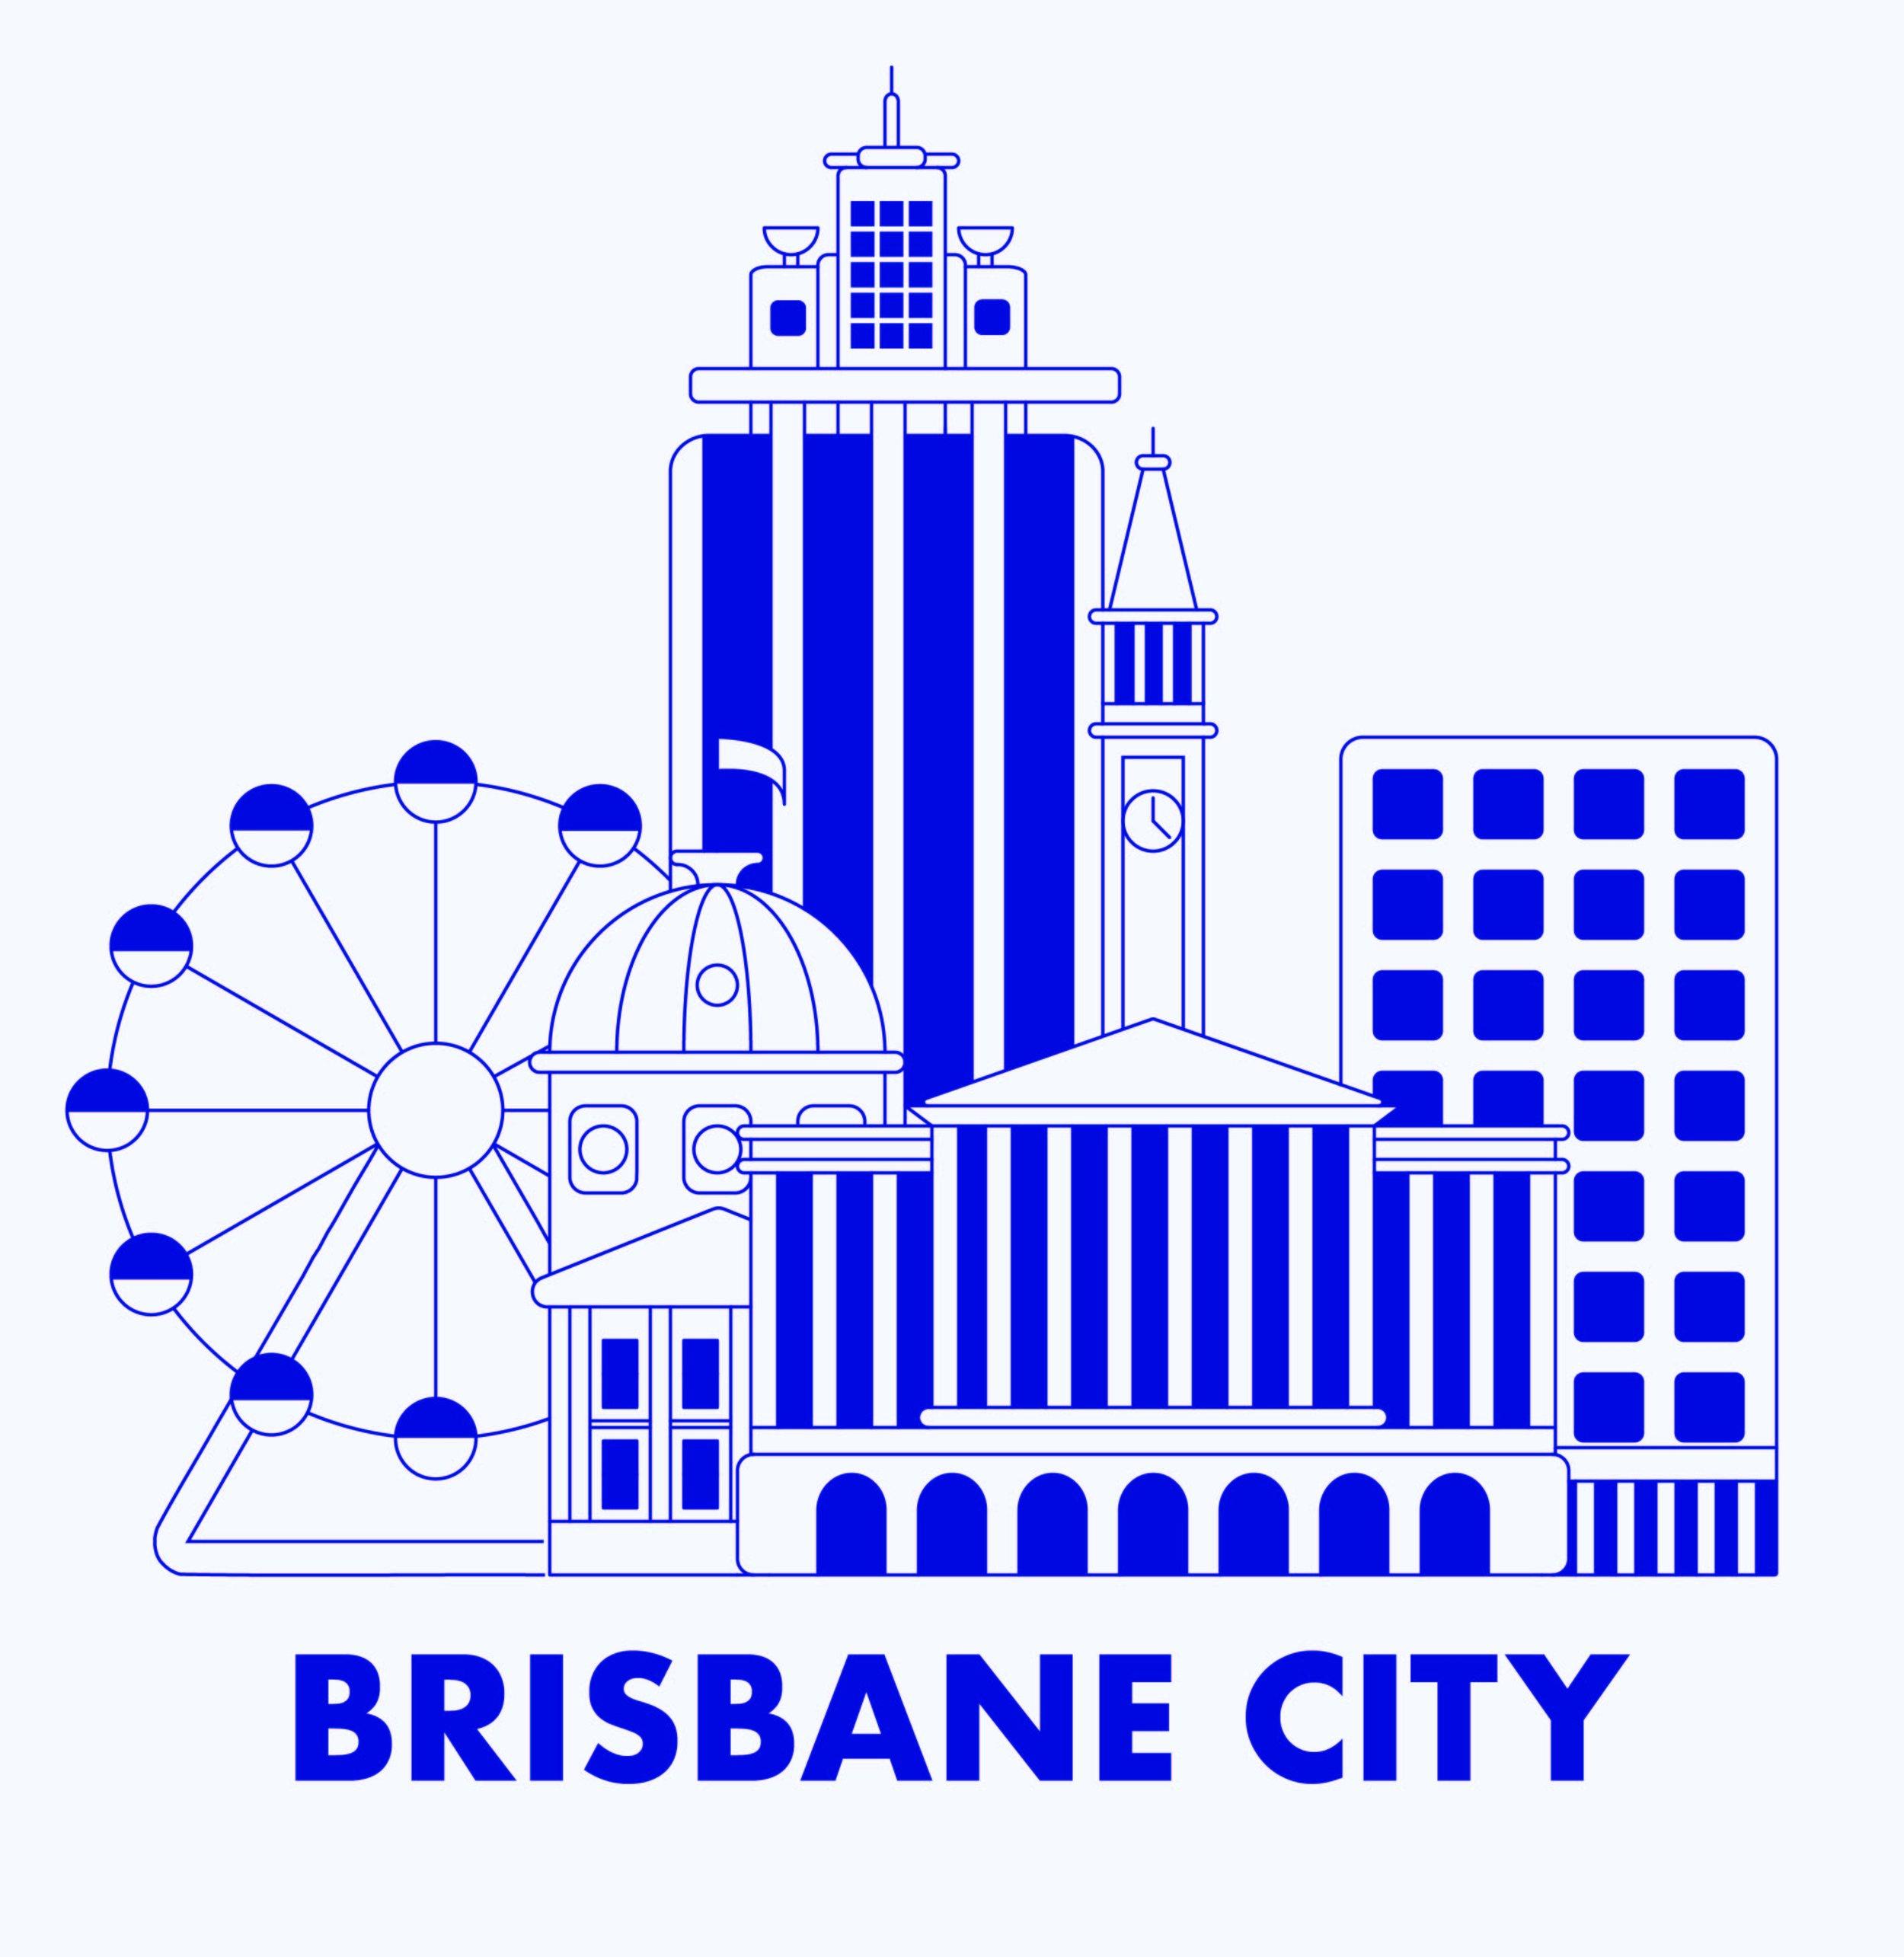 BRISBANE CITY-01.jpg